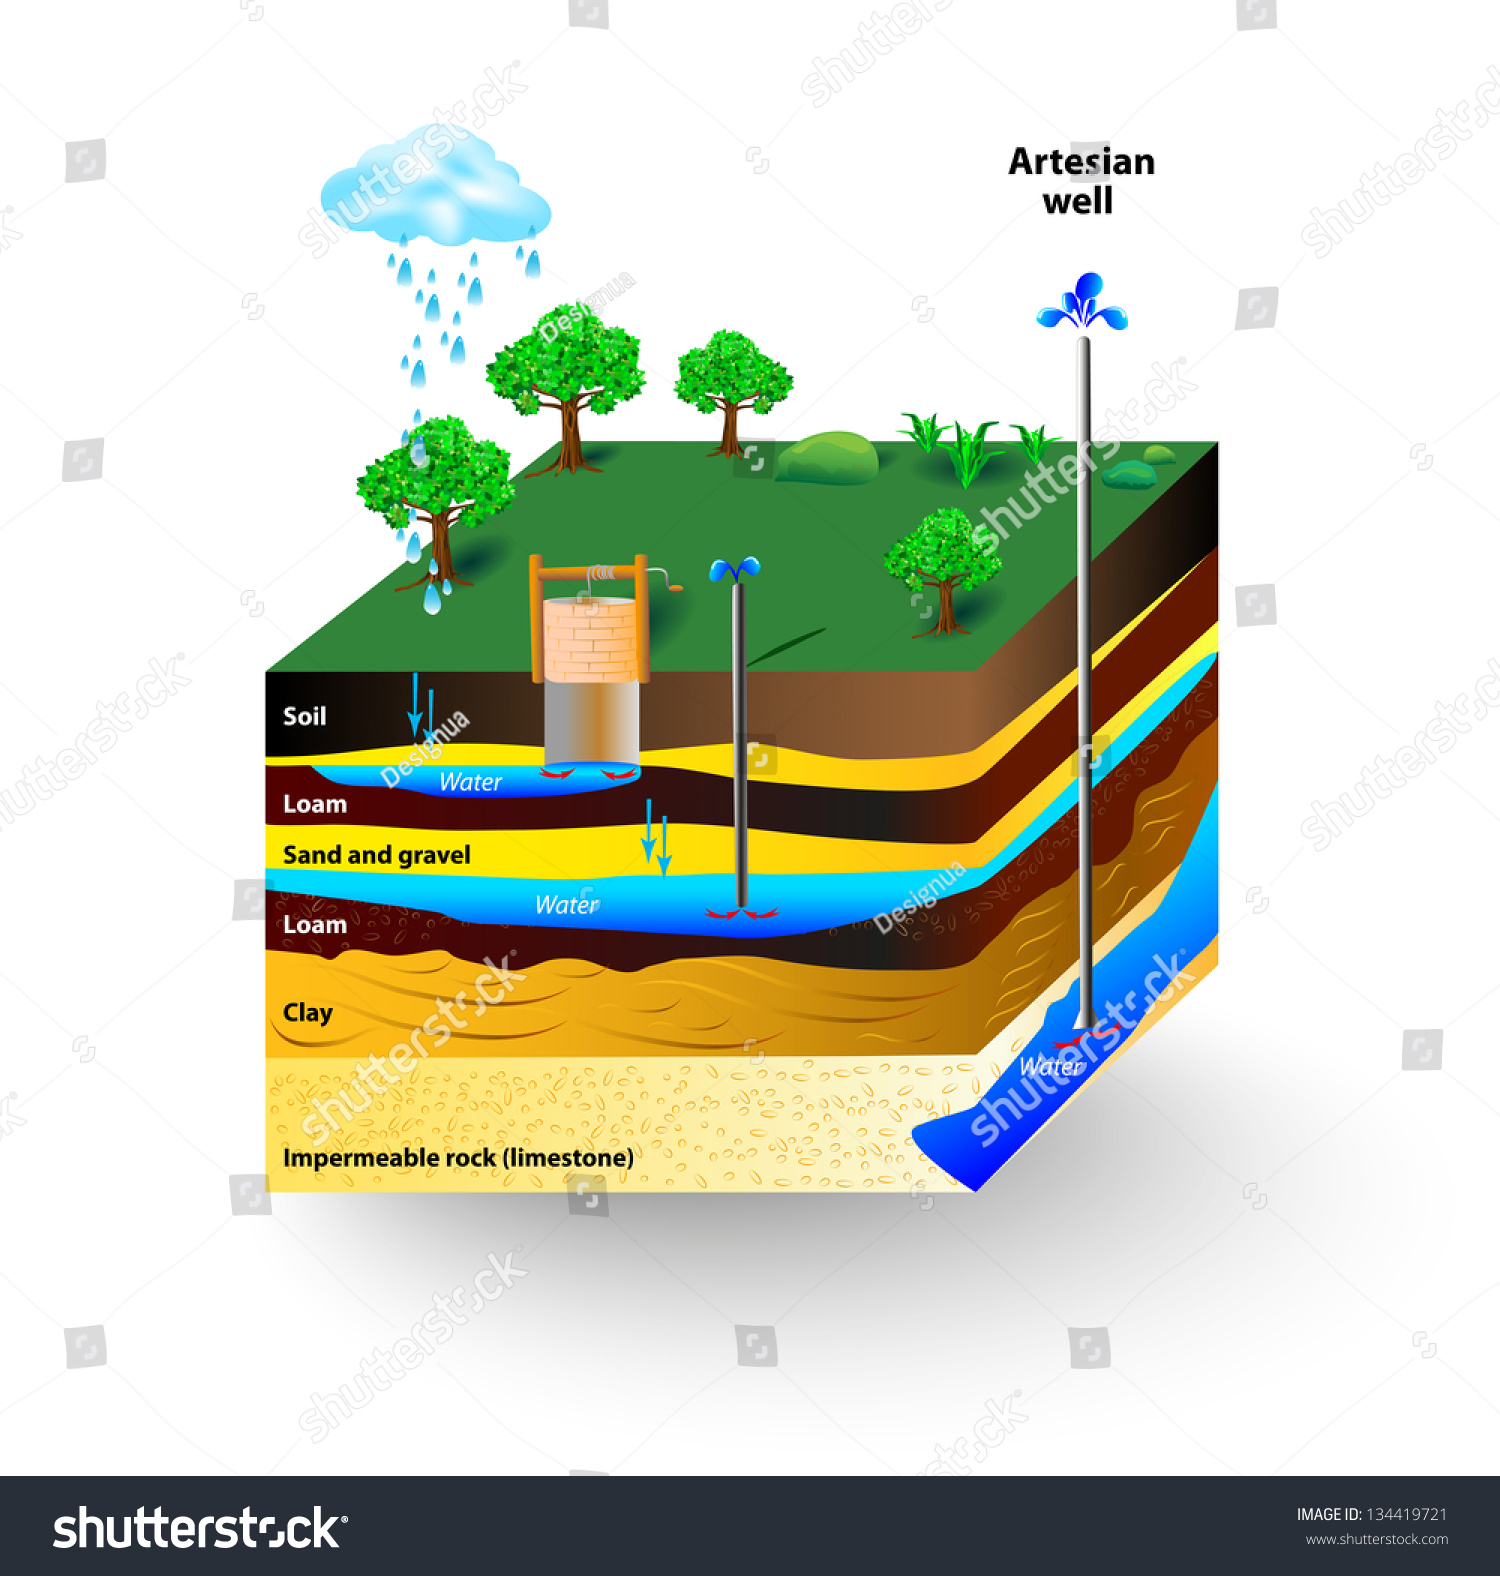 Artesian Water Groundwater Schematic Artesian Well Stock